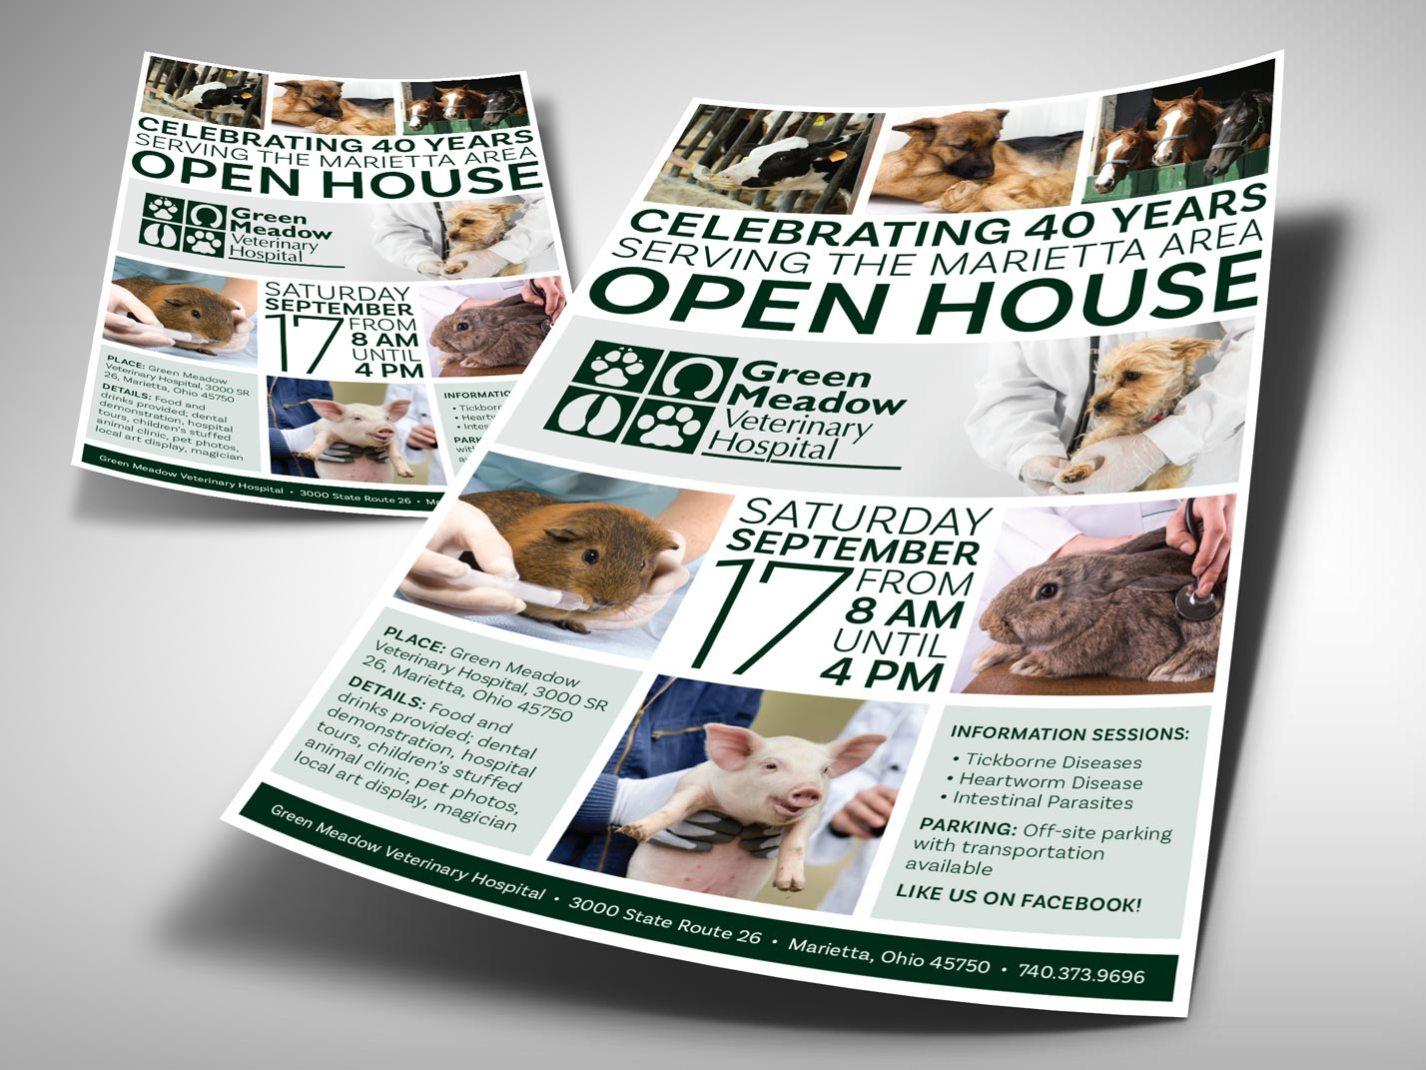 Green Meadow Veterinary Hospital Anniversary Promo